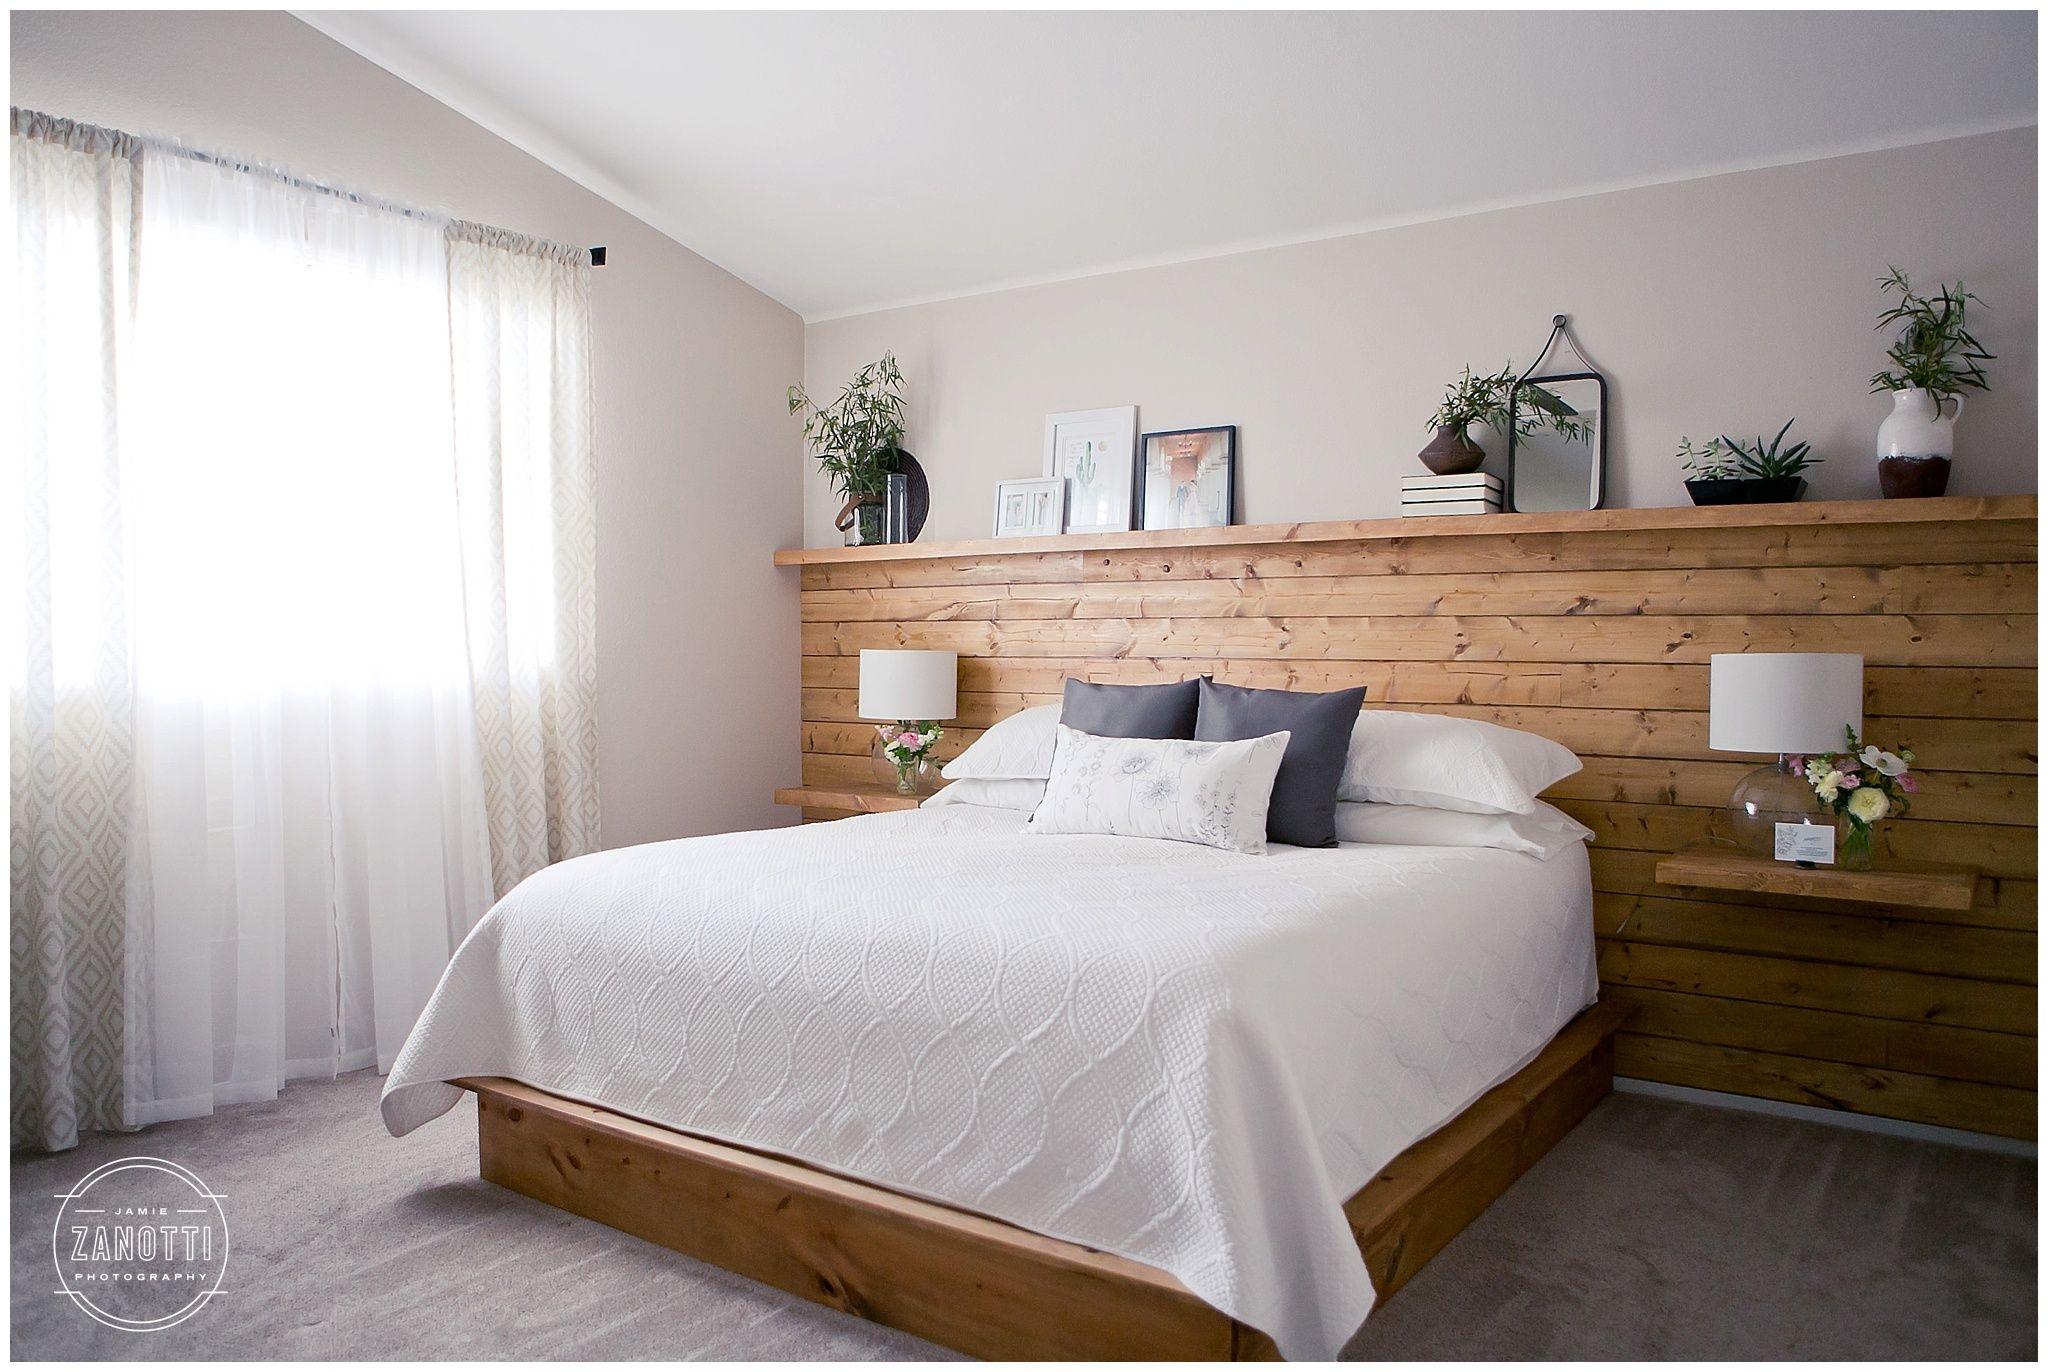 Diy Natural Wood Shiplap Tongue And Groove Headboard Wall With